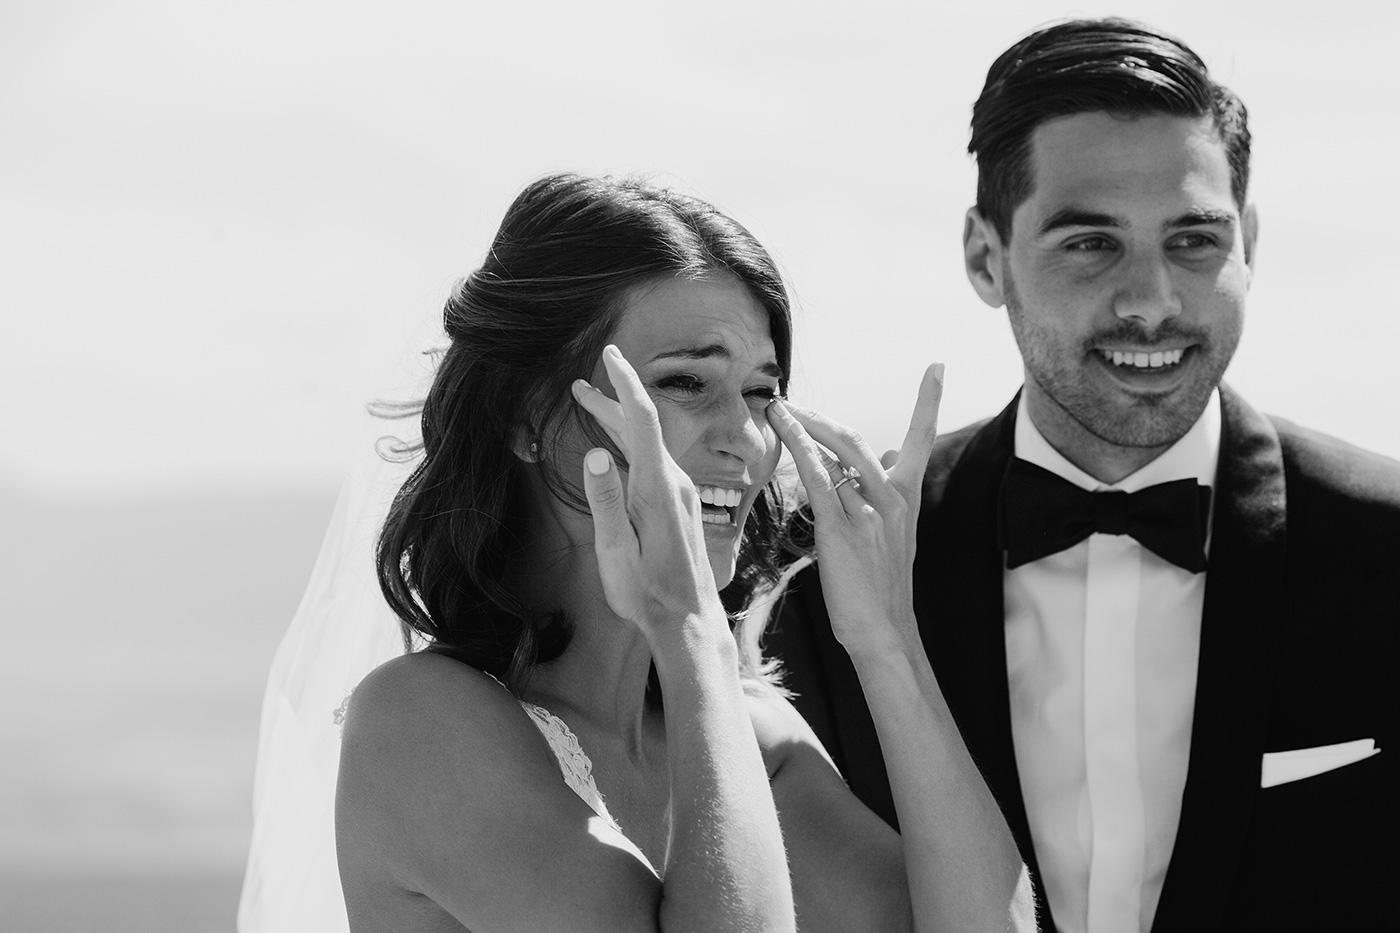 happy-wedding-tears-bride-and-groom-web.jpg